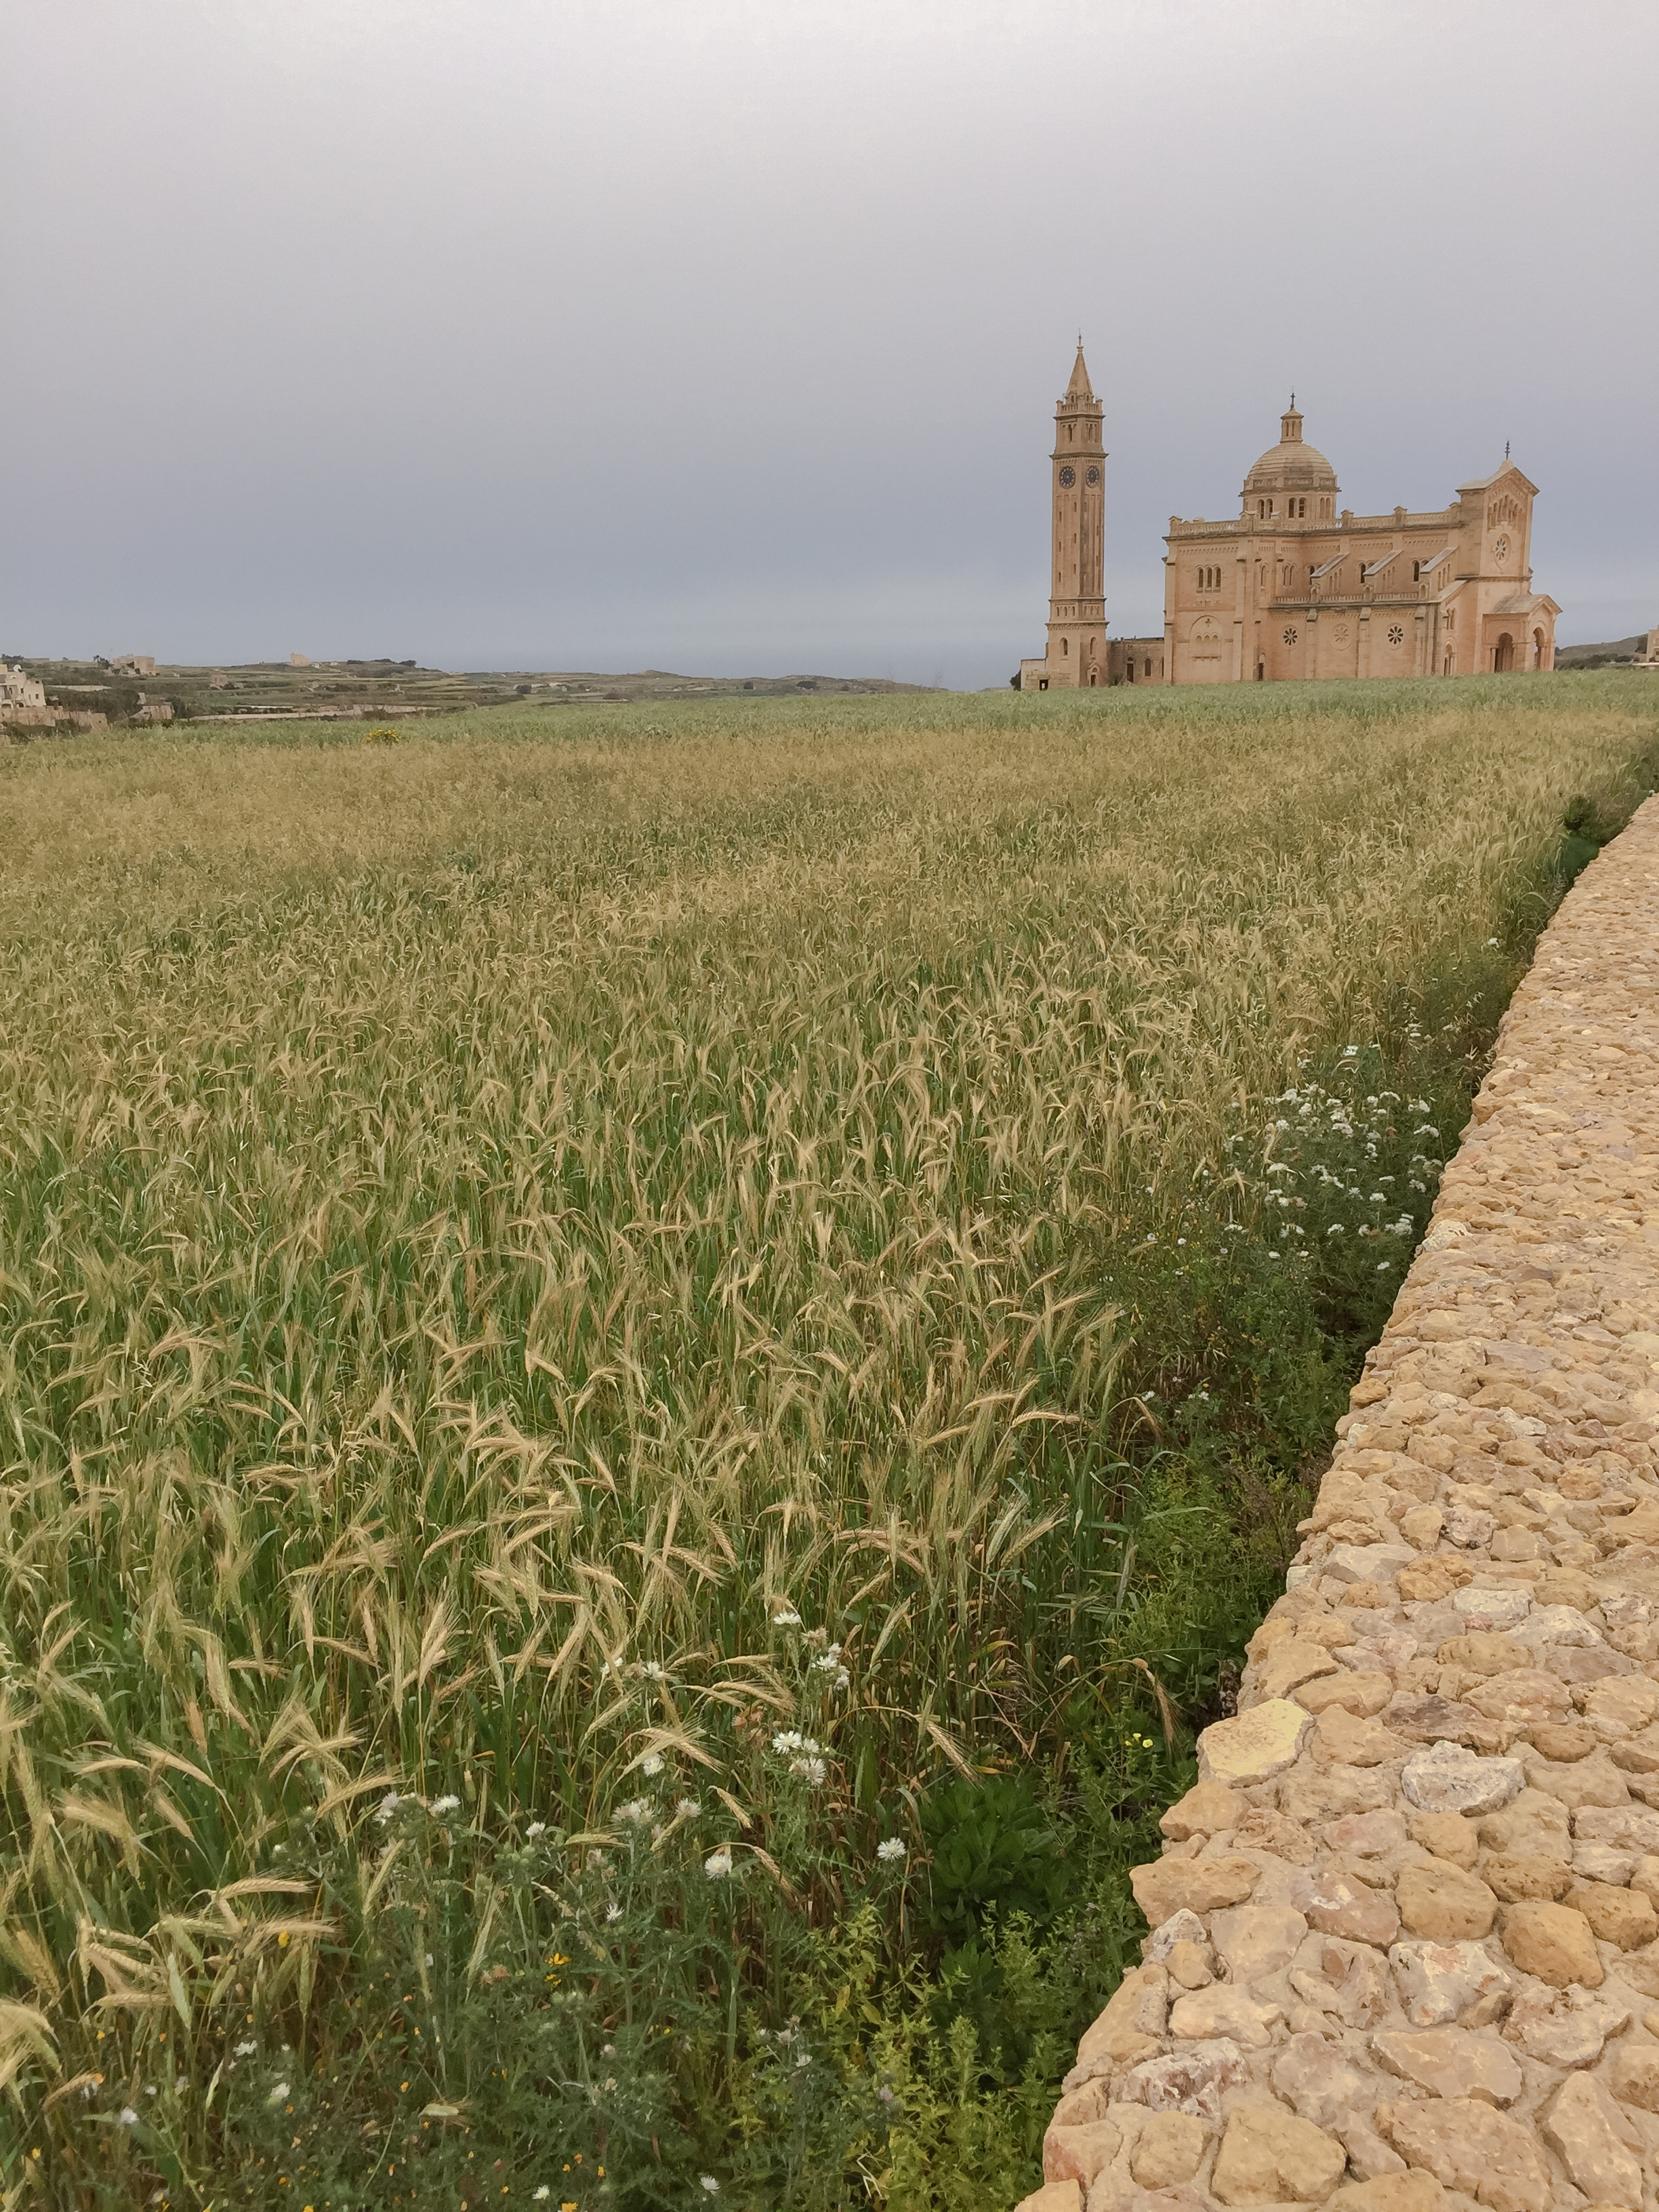 Shrine of Our Lady of Ta' Pinu Roman Catholic Minor Basilica | MAltese Islands Nature | LAndscape - Thinking About Appreciation For Quality In Malta | Gozo, Malta, Europe | DoLessGetMoreDone.com | - iPone Minimal Fine Art Travel Documentary Photography - search for Liveability | Sustainability